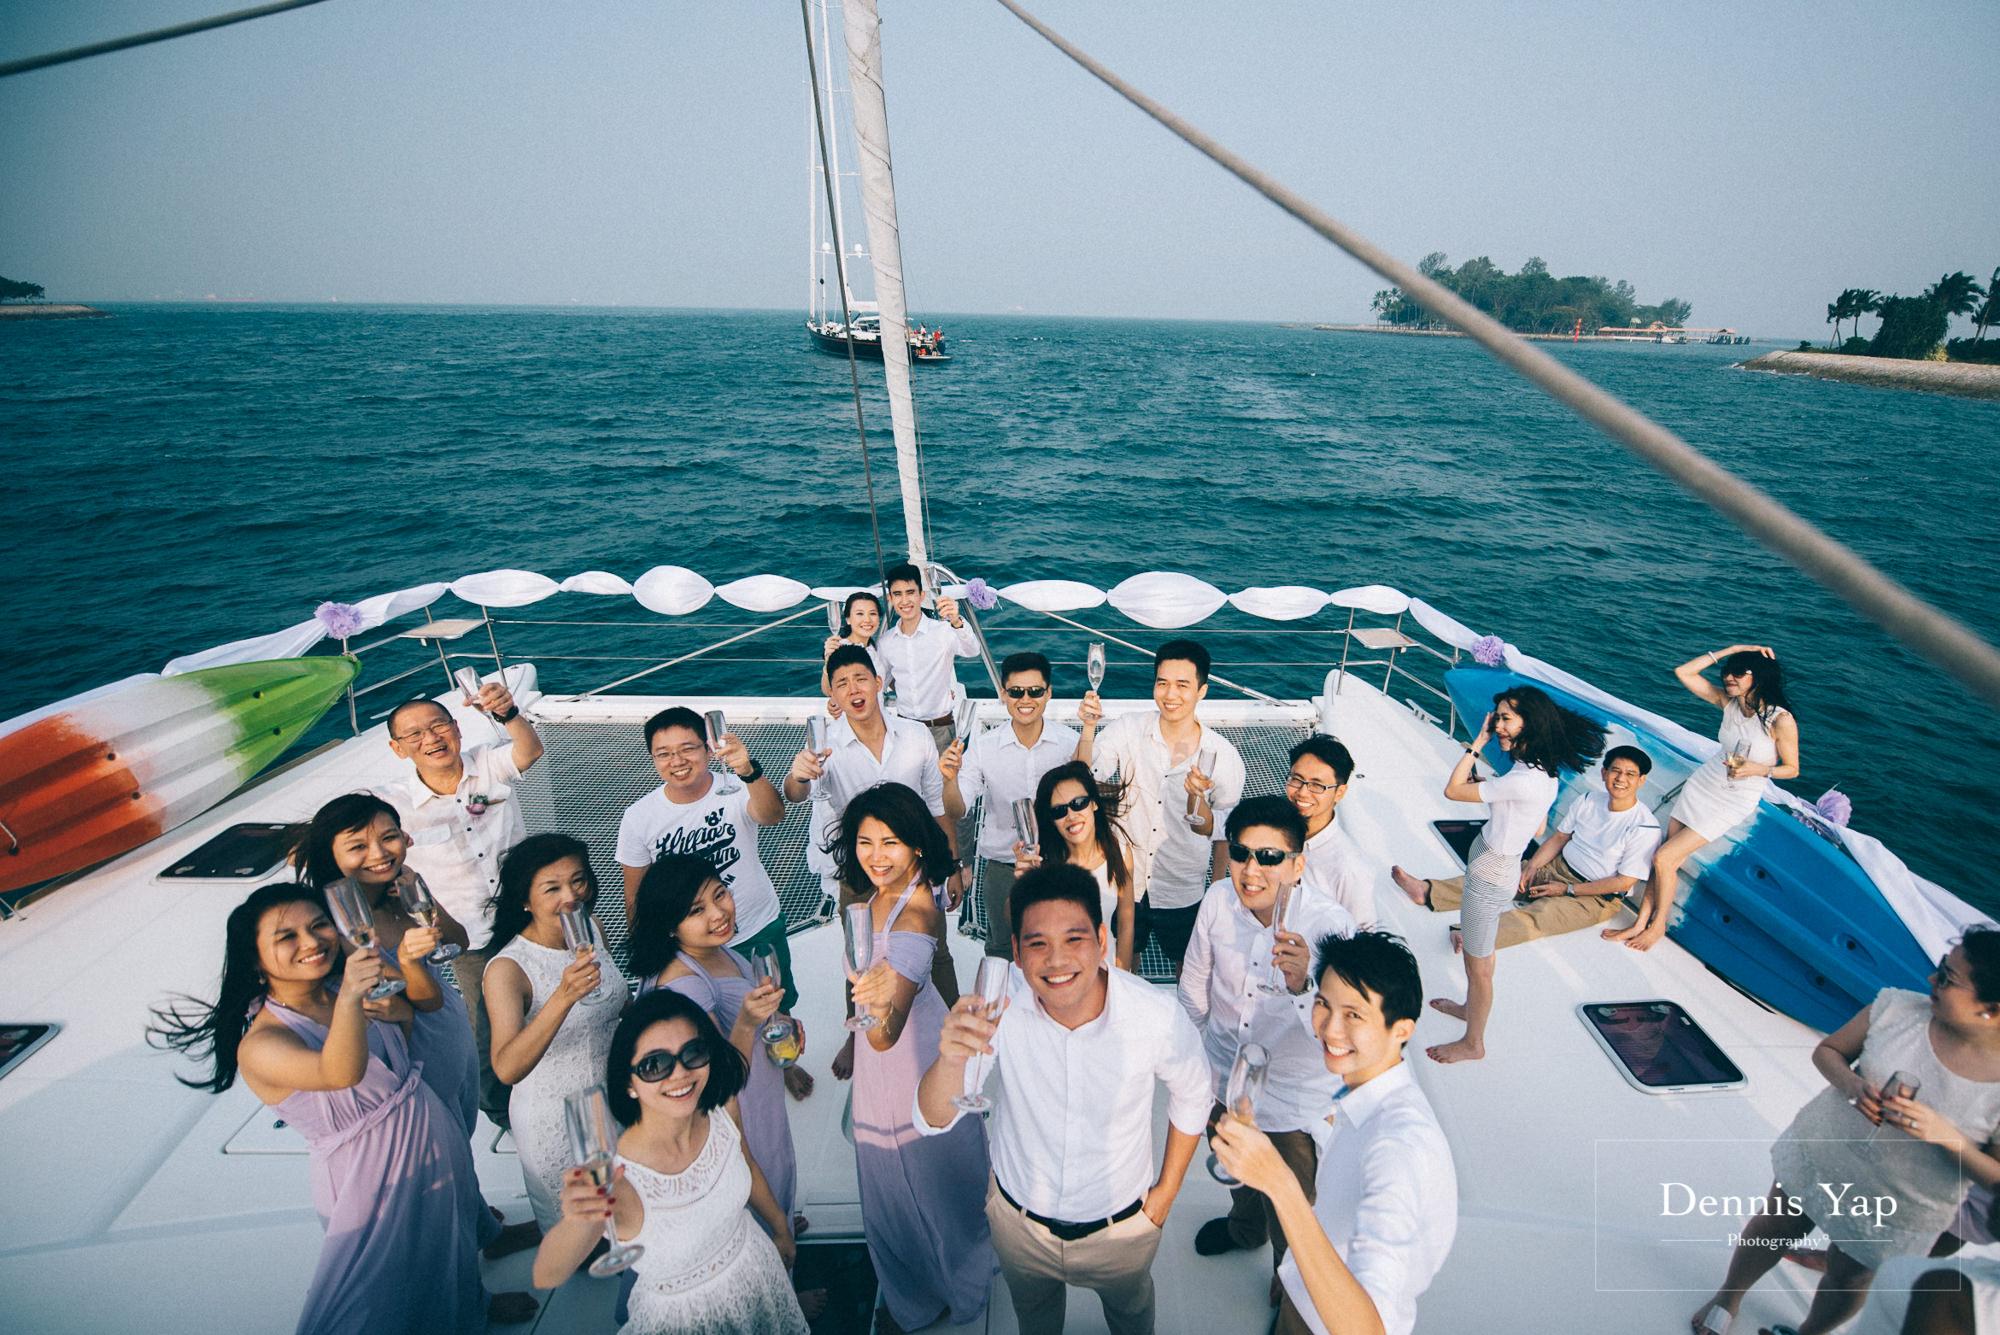 danny sherine wedding reception registration of marriage yacht fun beloved sea dennis yap photography malaysia top wedding photographer-37.jpg